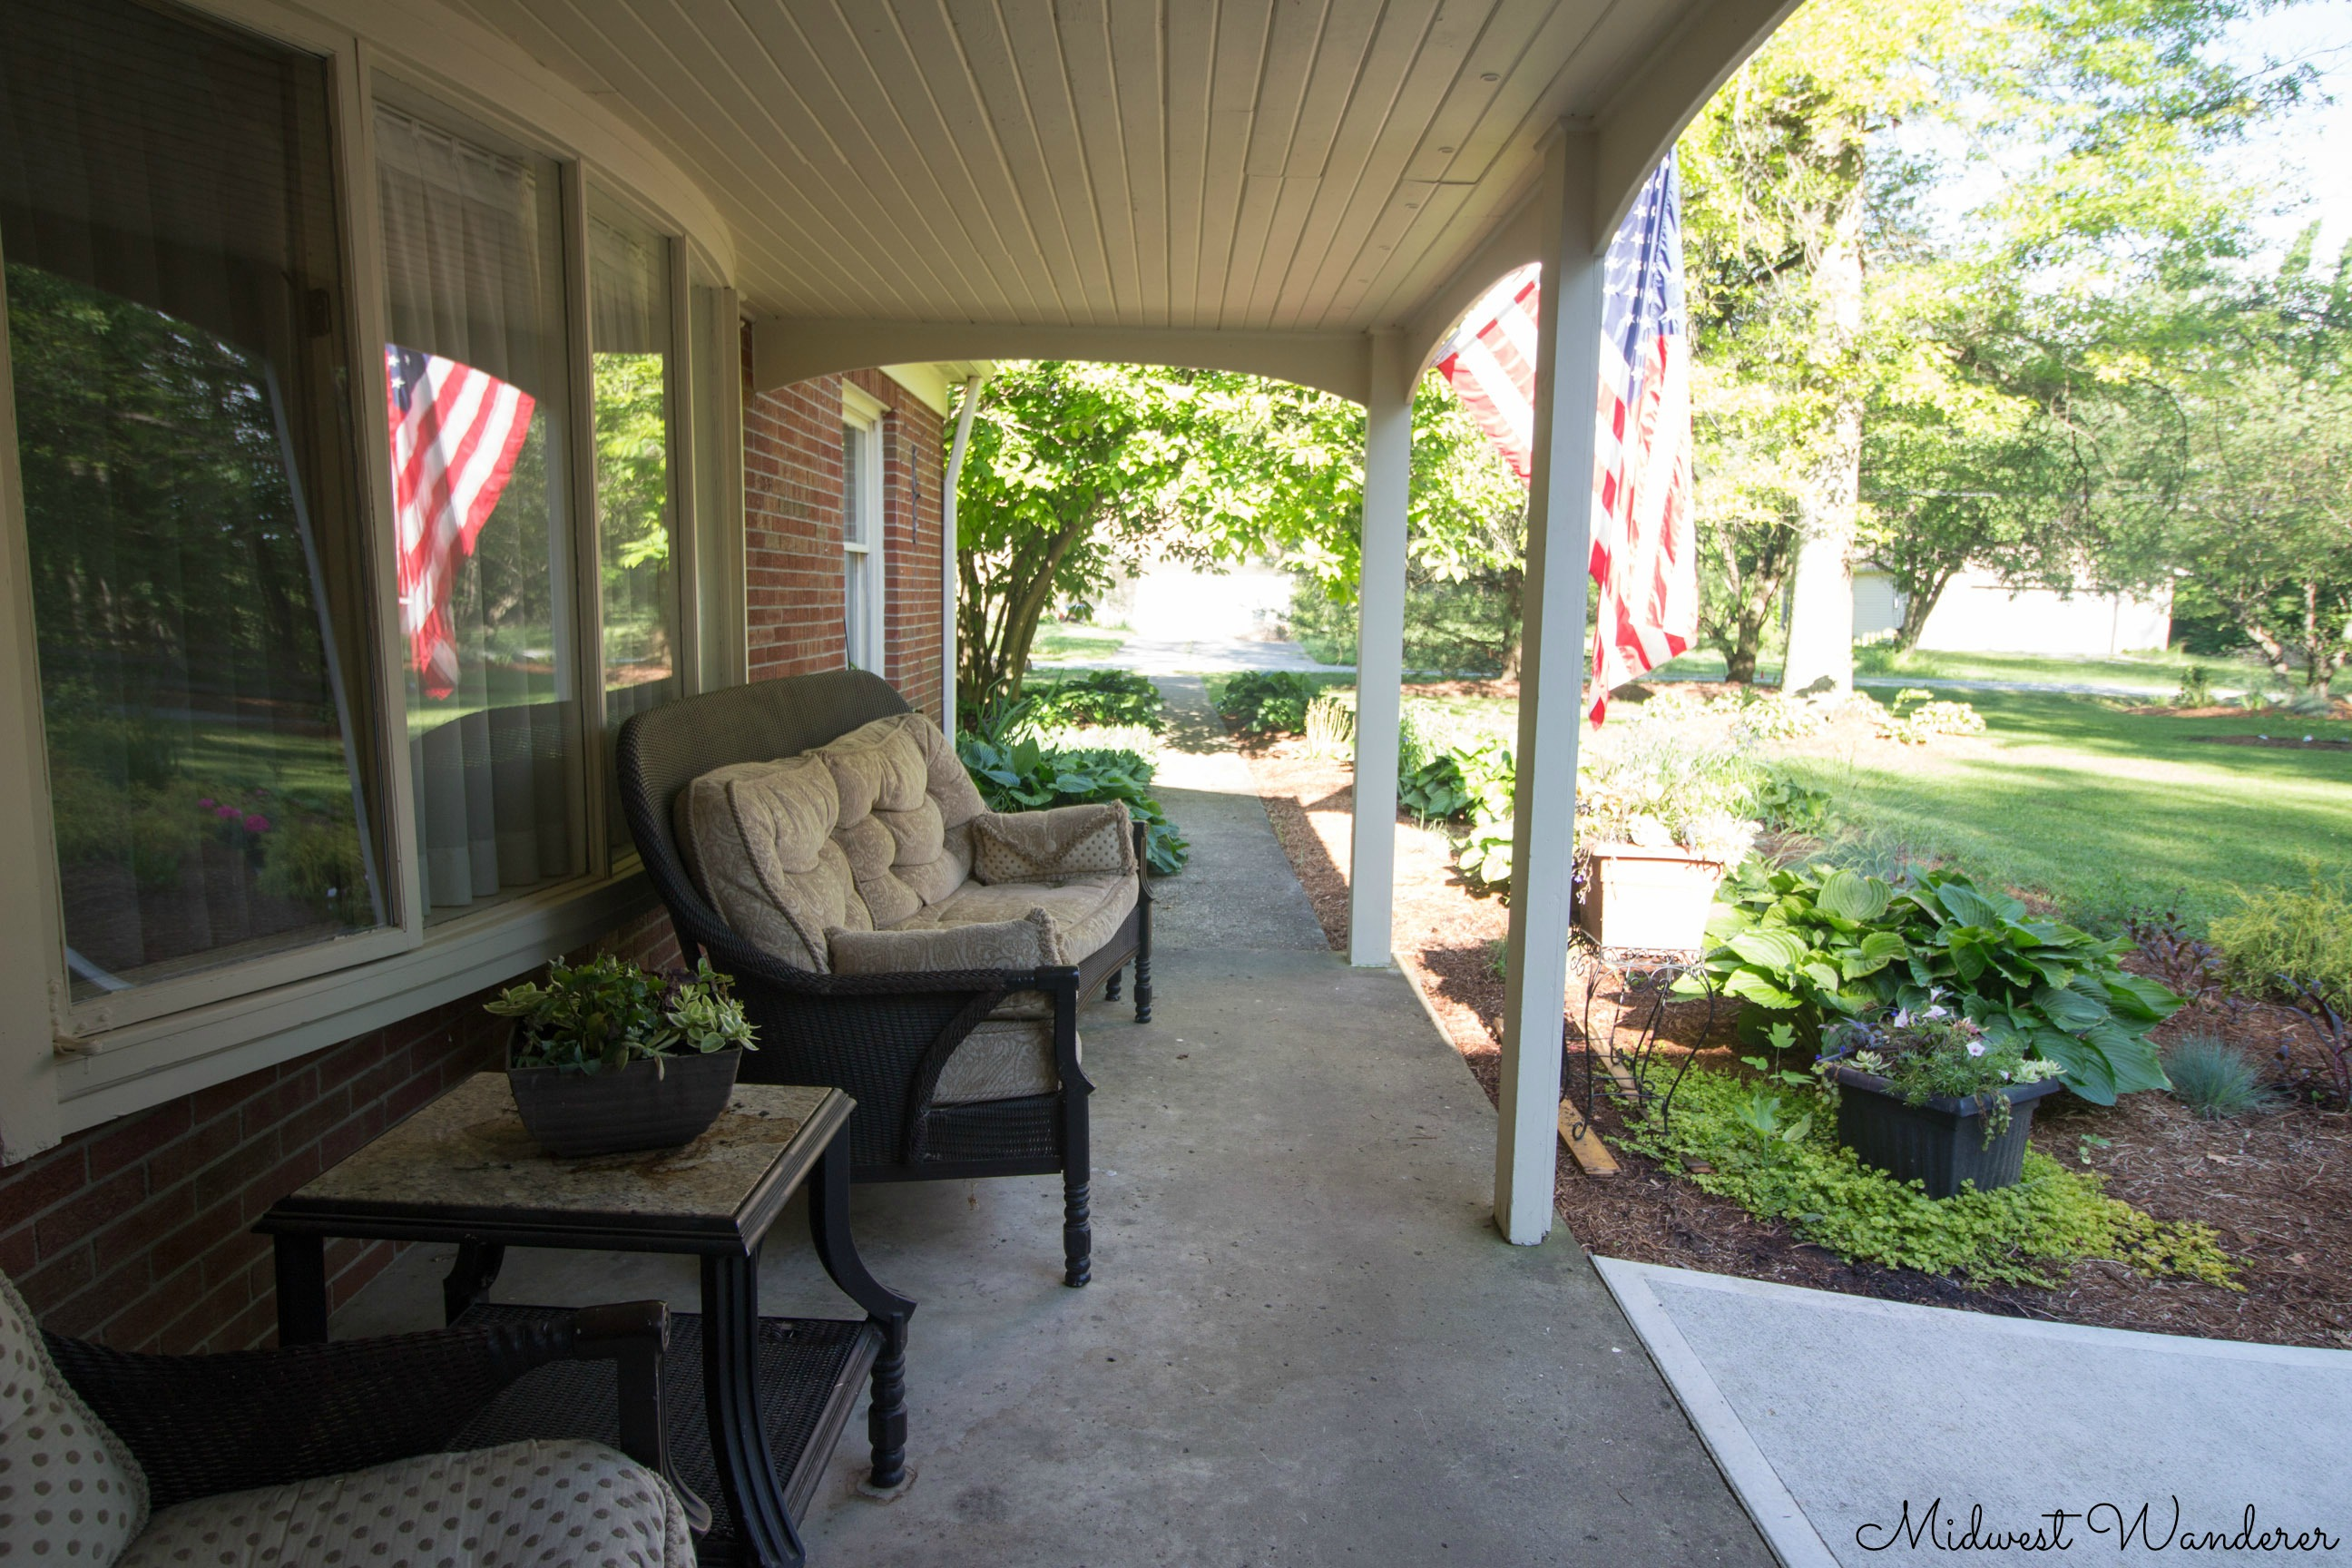 Seldom Scene B&B porch